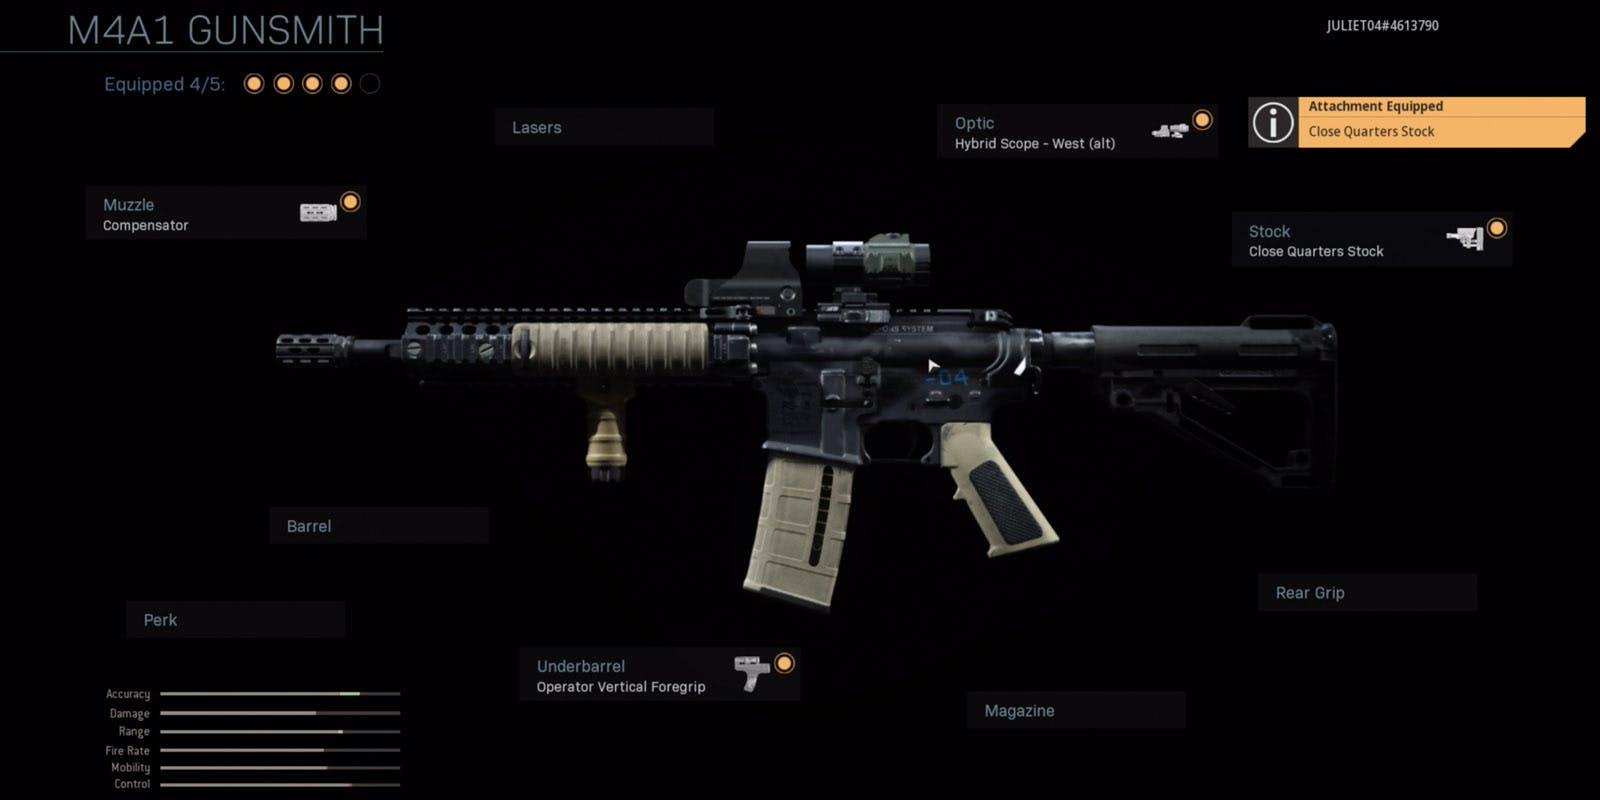 Call-of-Duty-Modern-Warfare-Weapons-List.jpg